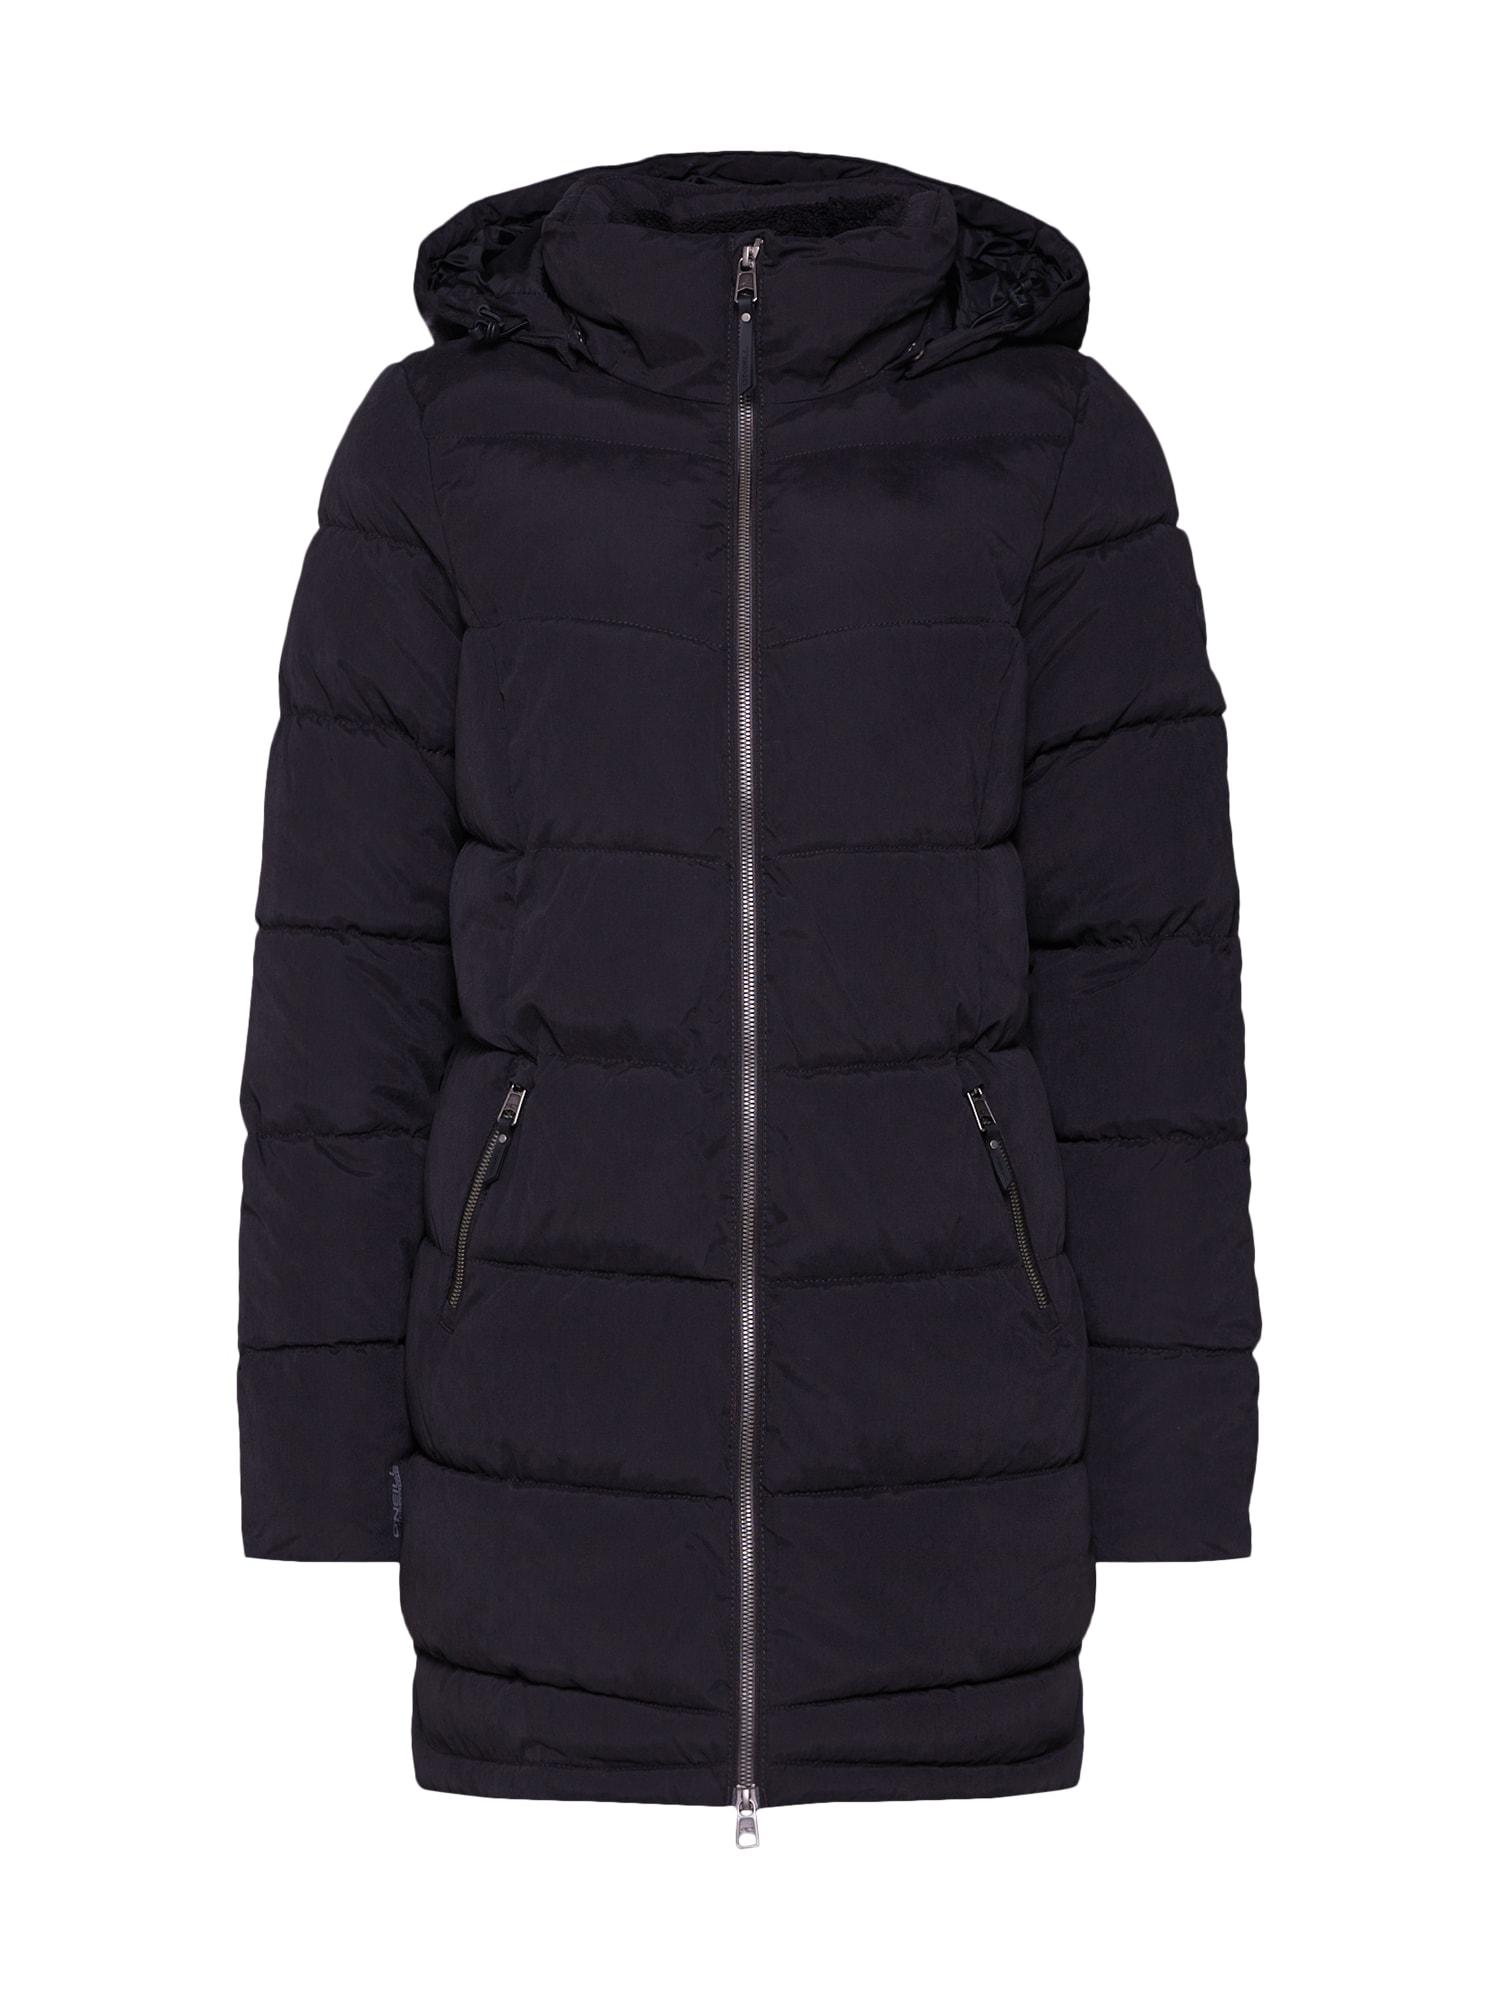 ONEILL Funkční kabát LW Control Jacket černá O'NEILL